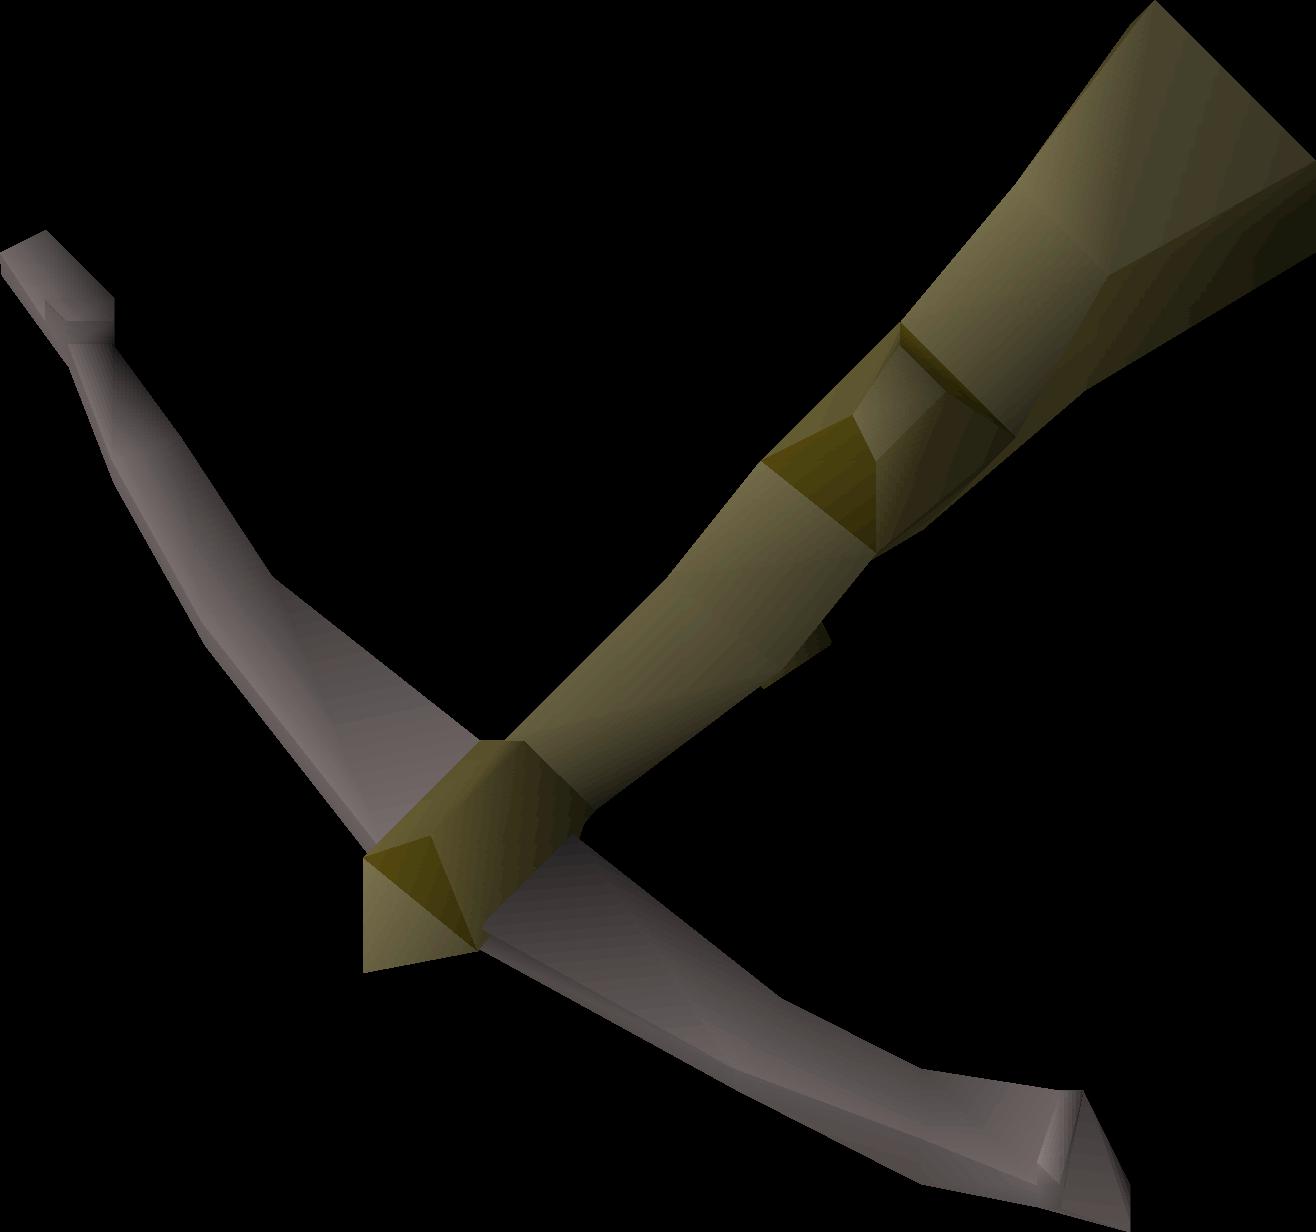 Iron crossbow (u)